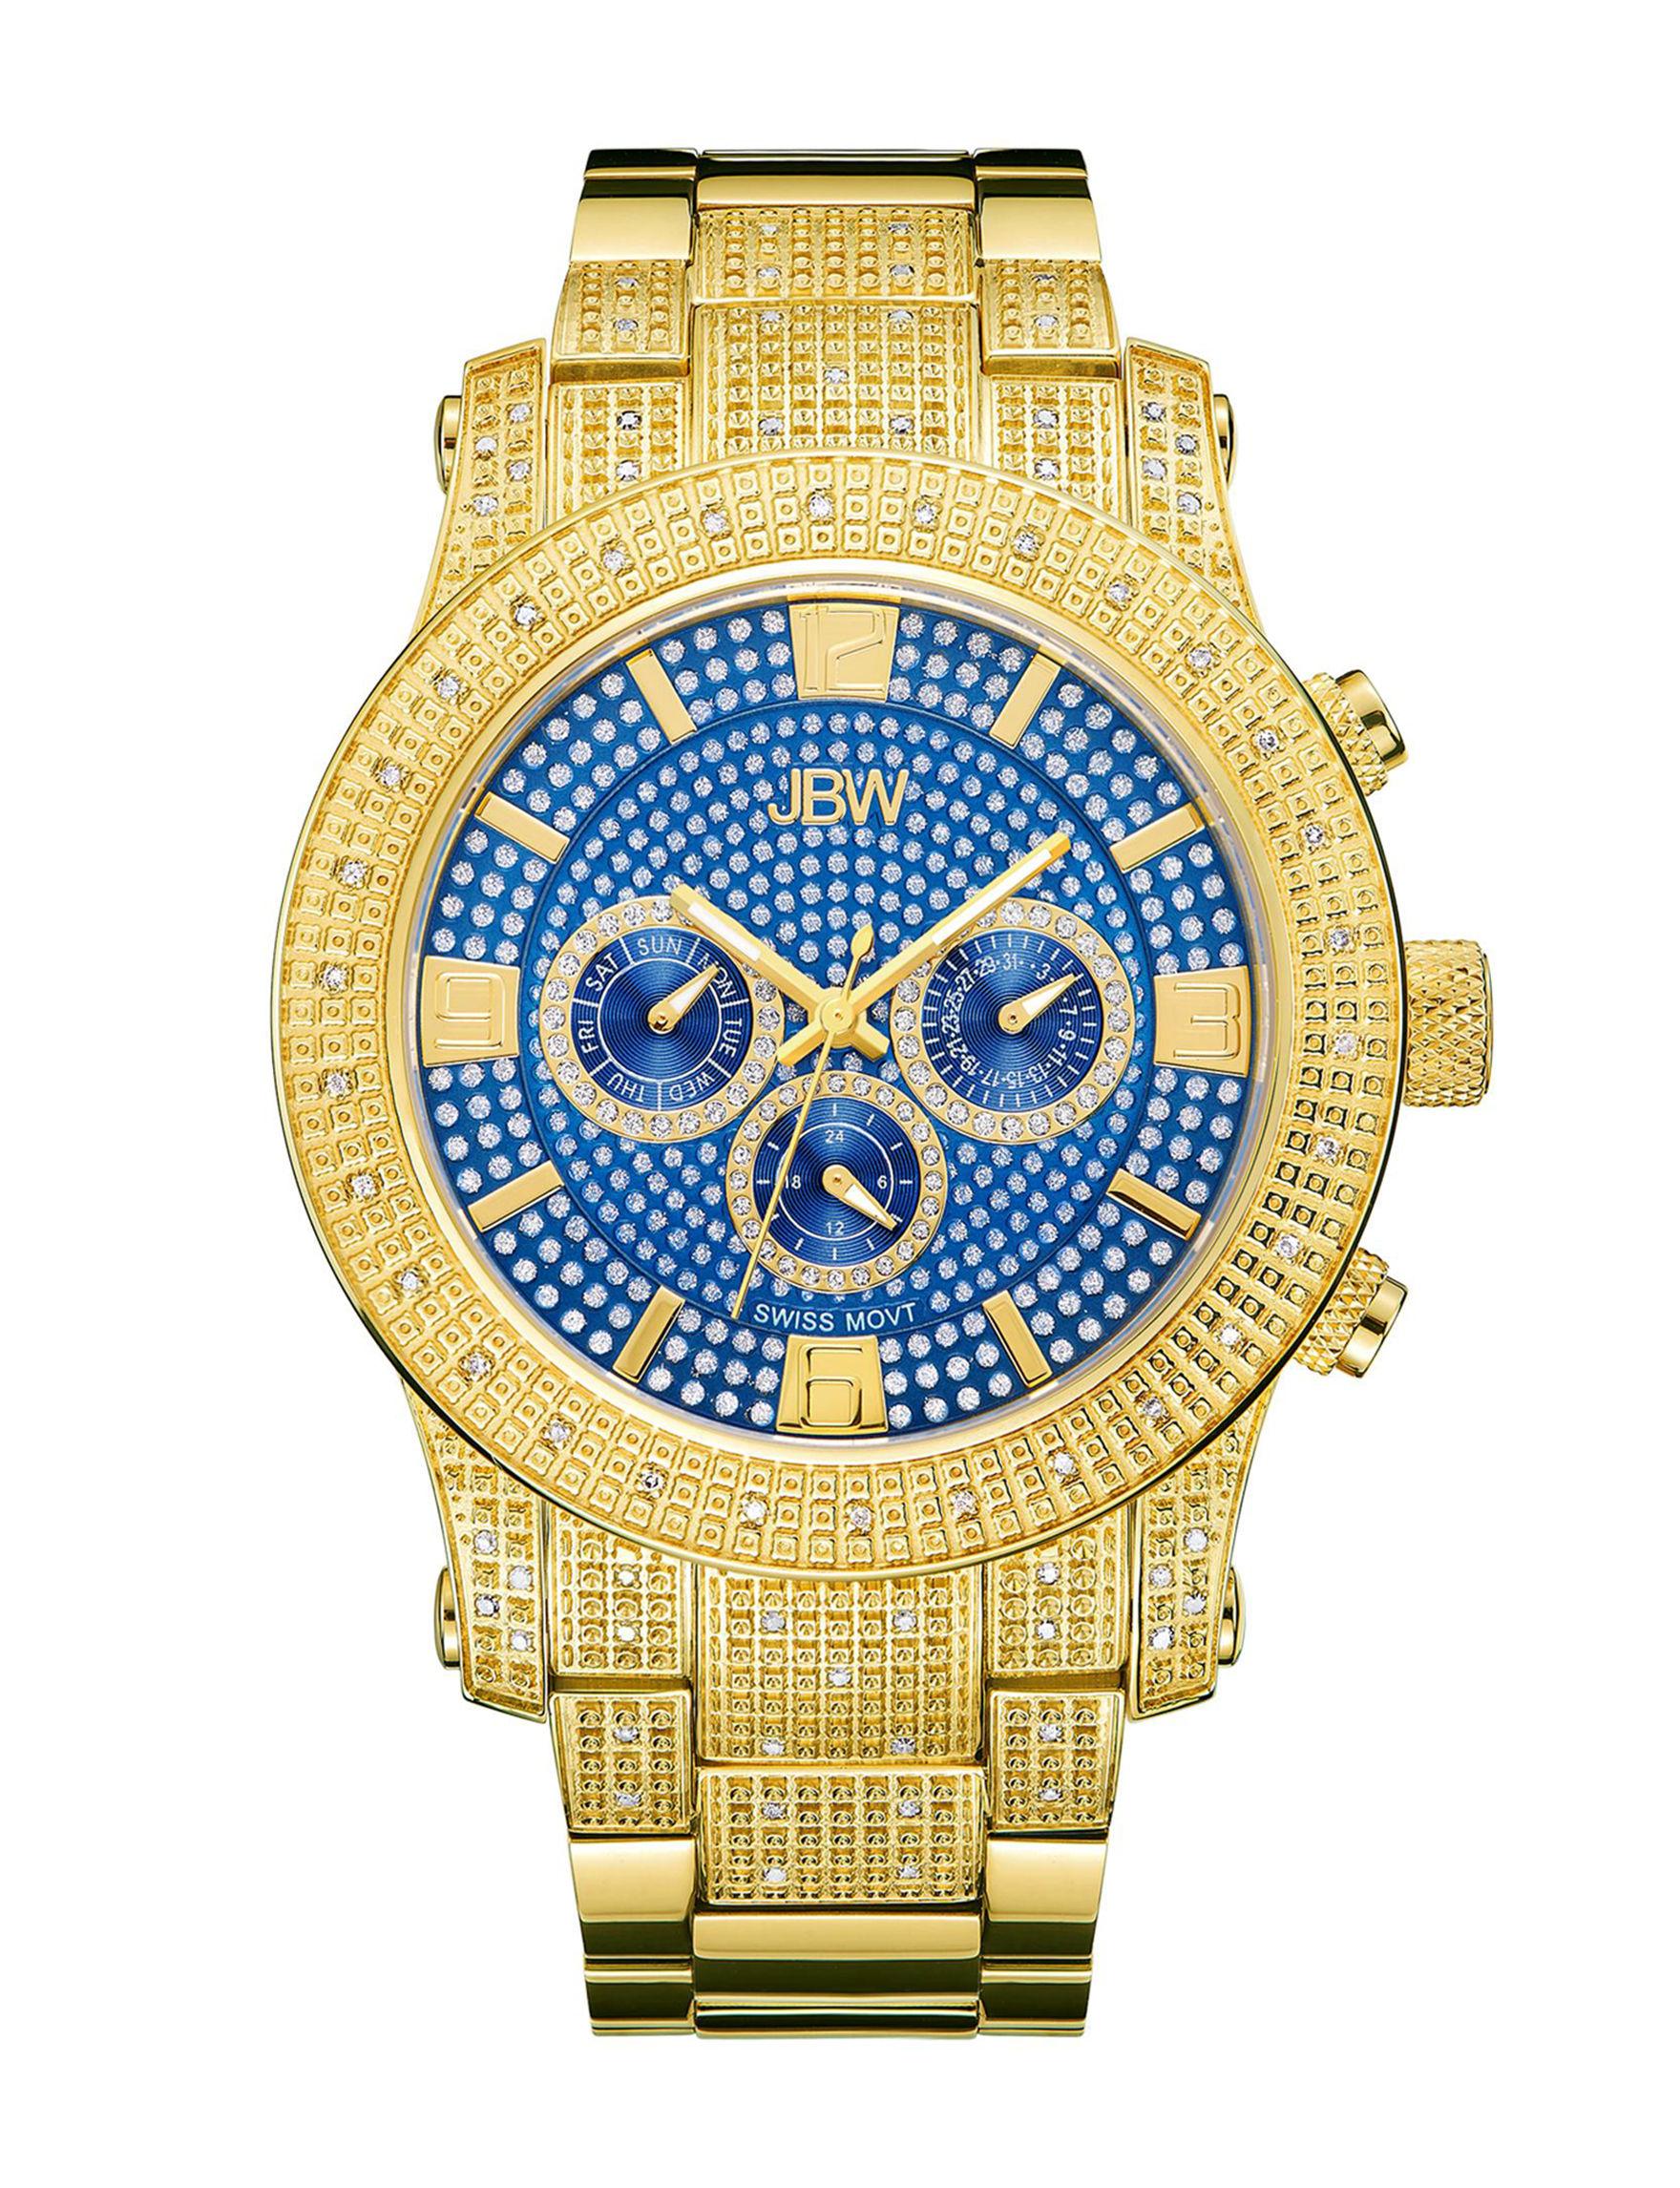 JBW Gold Fashion Watches